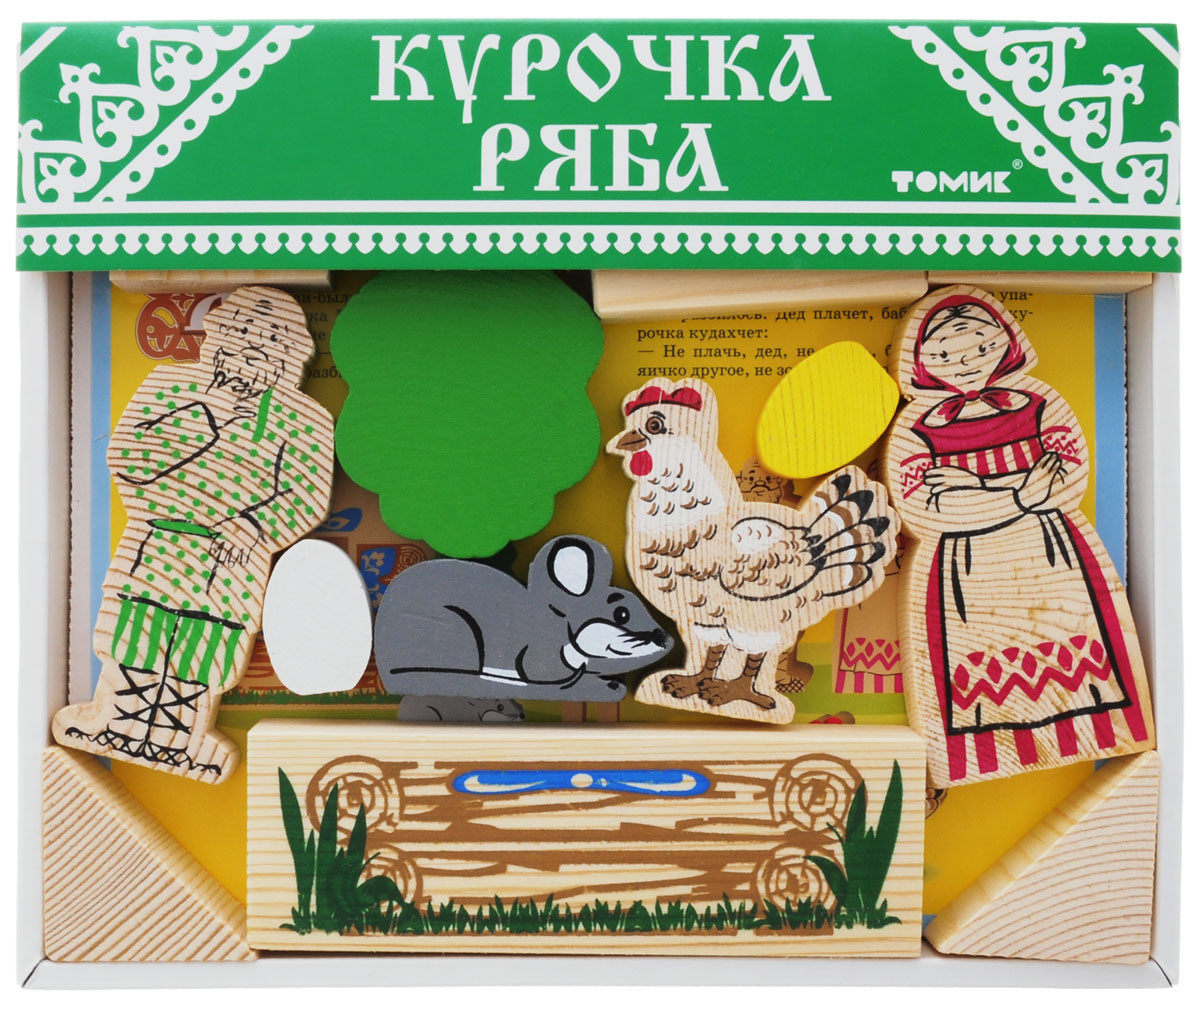 Томик Конструктор Курочка Ряба